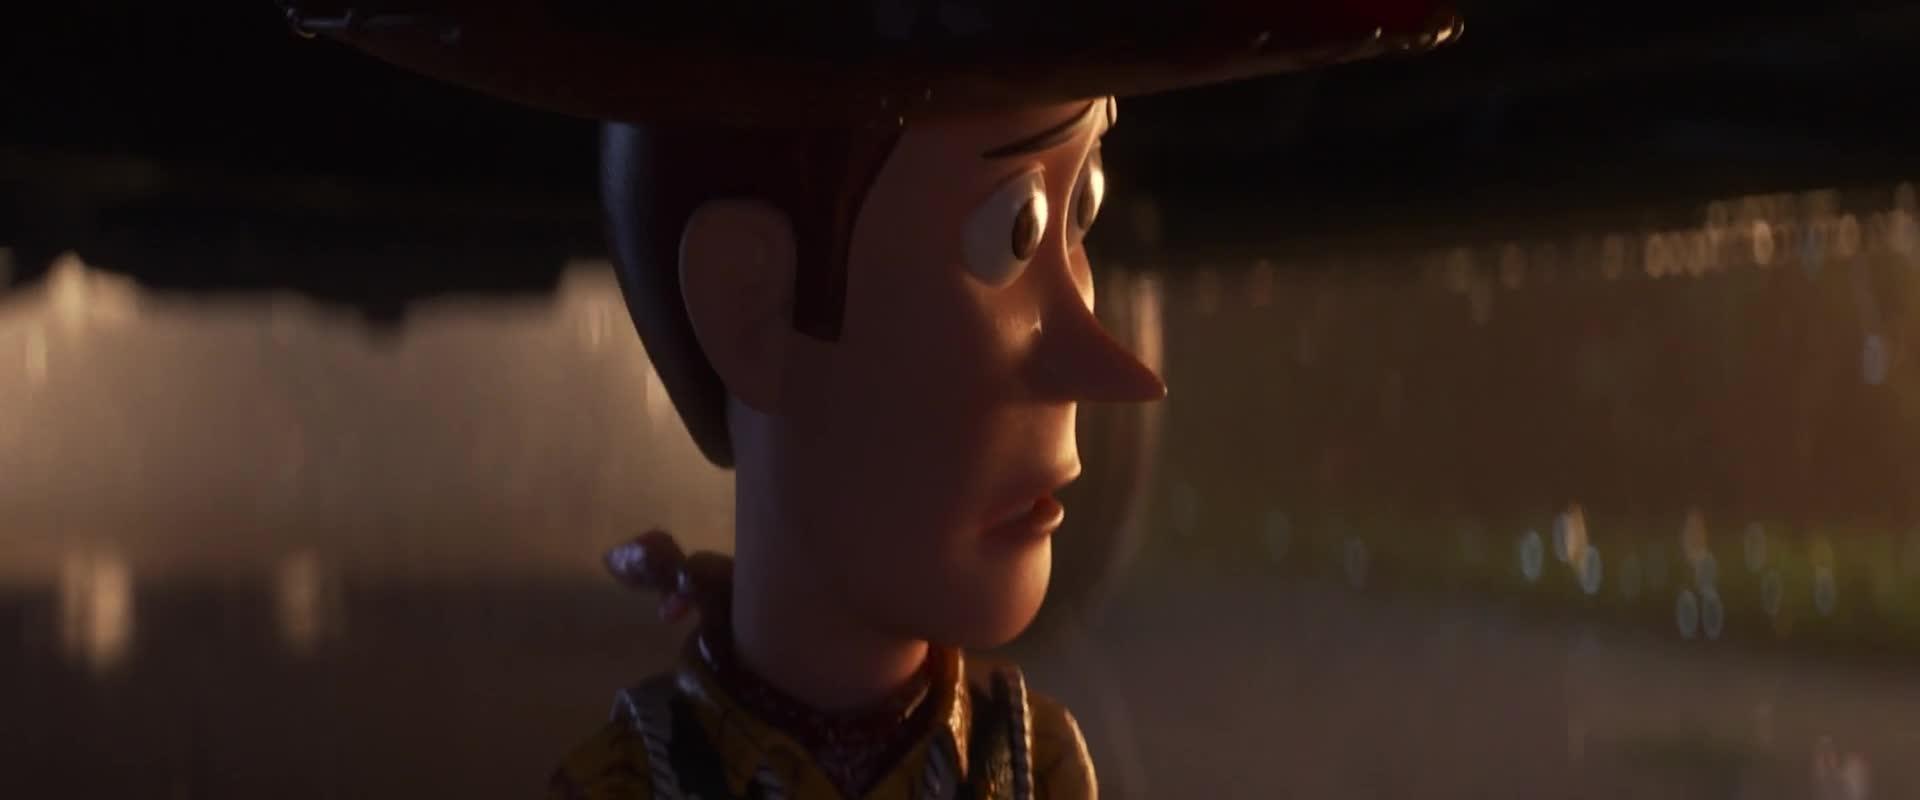 Toy Story 4 Pribeh hracek 2019 CZ dabing HD